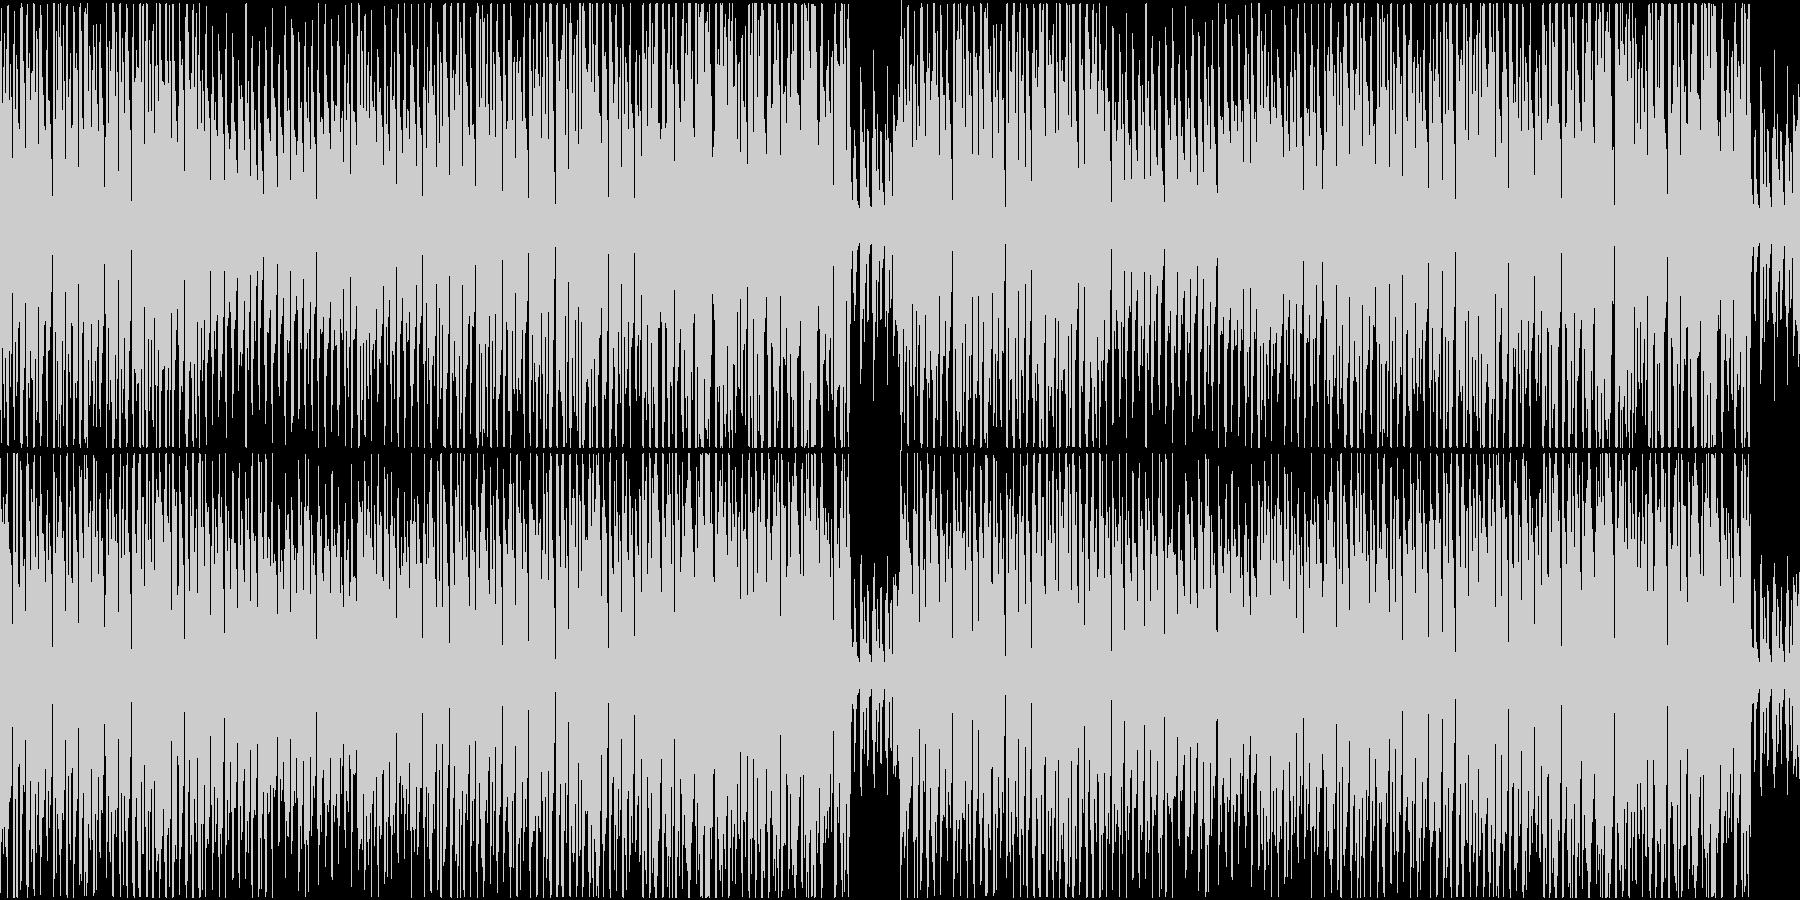 CM用明るいコミカルマーチの未再生の波形